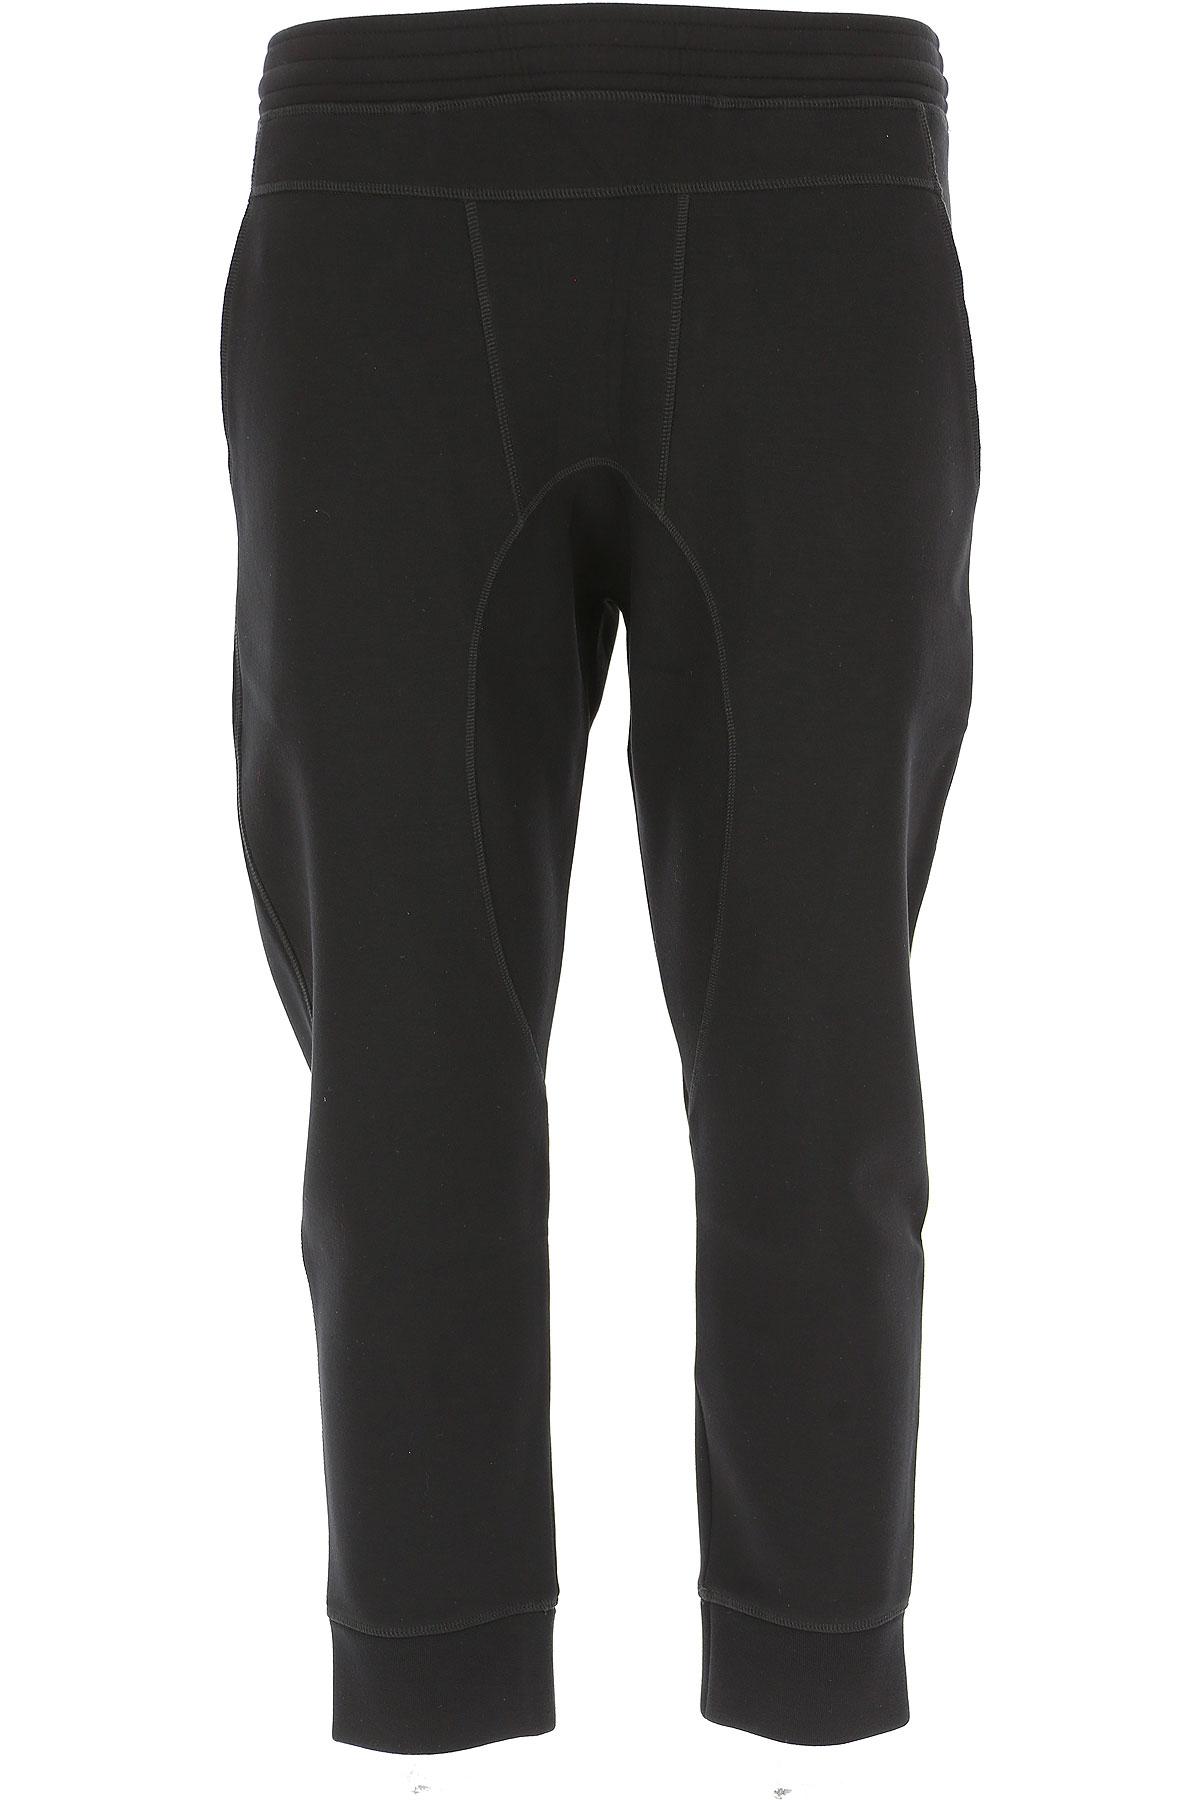 Neil Barrett Pants for Men On Sale in Outlet, Black, viscosa, 2019, L M